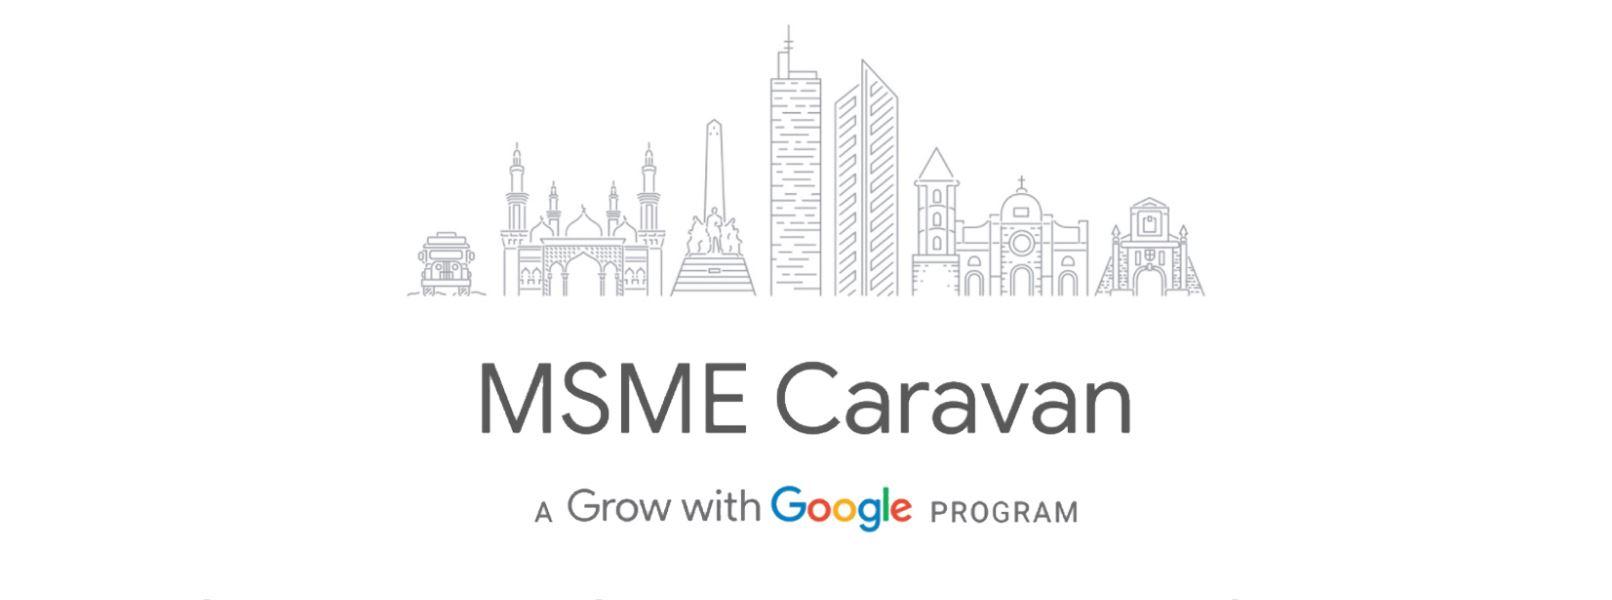 Google Free webinar for MSMEs